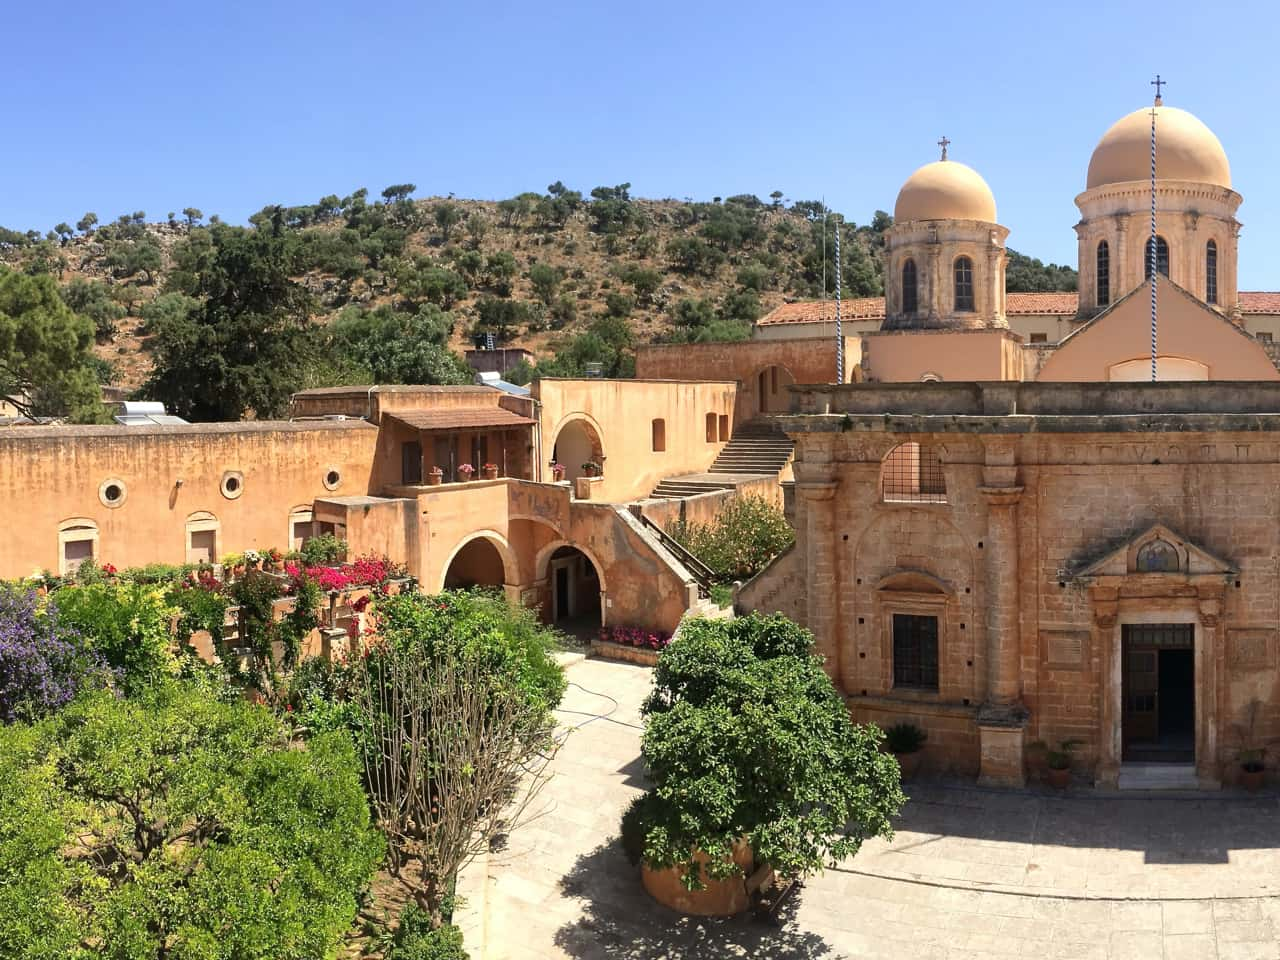 Agia Triada (Holy Trinity), or the Tsangarolon Monastery of the 17th century